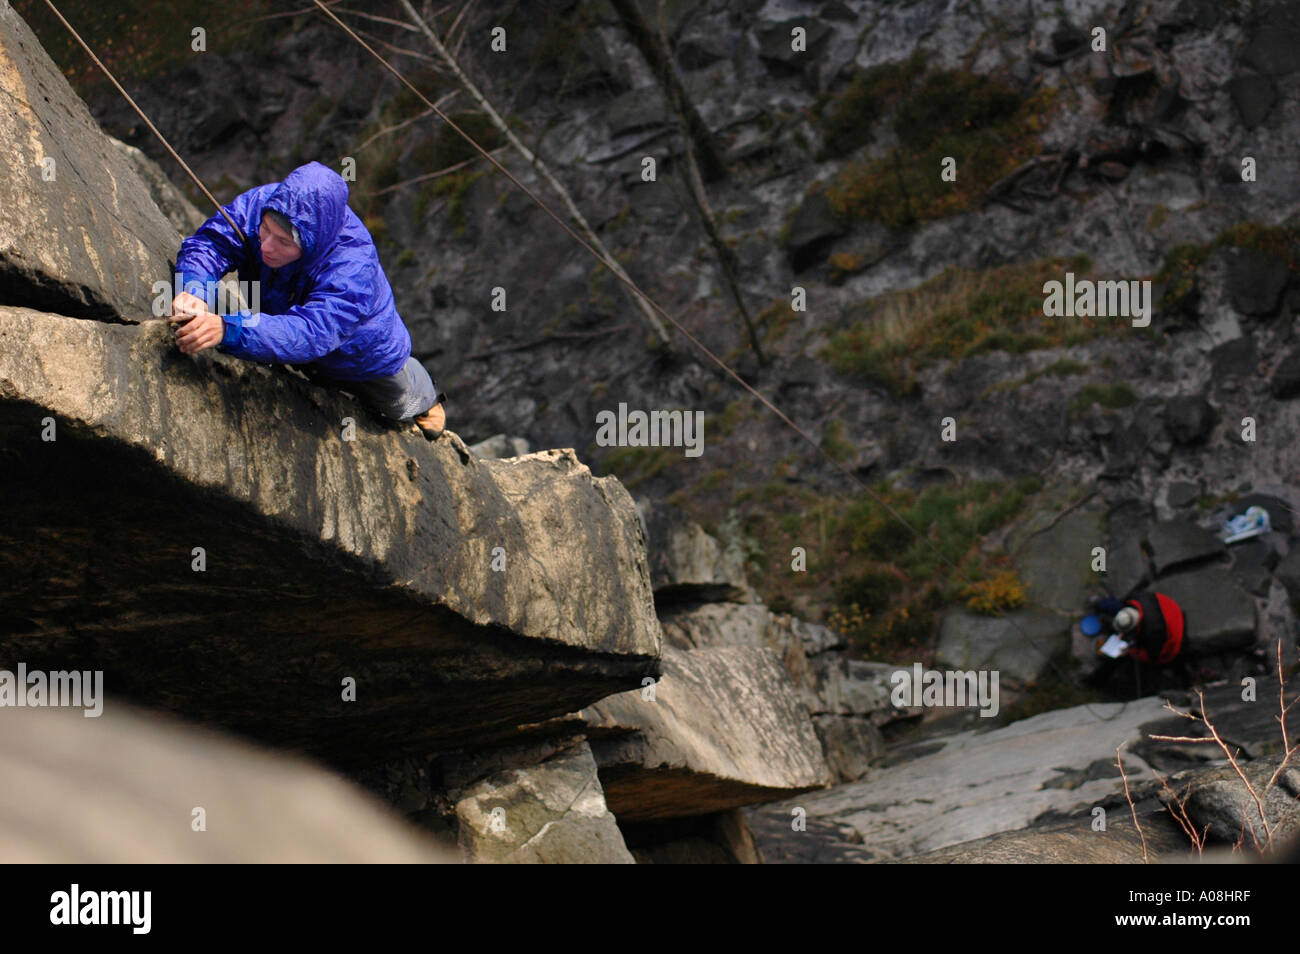 Climber dating site